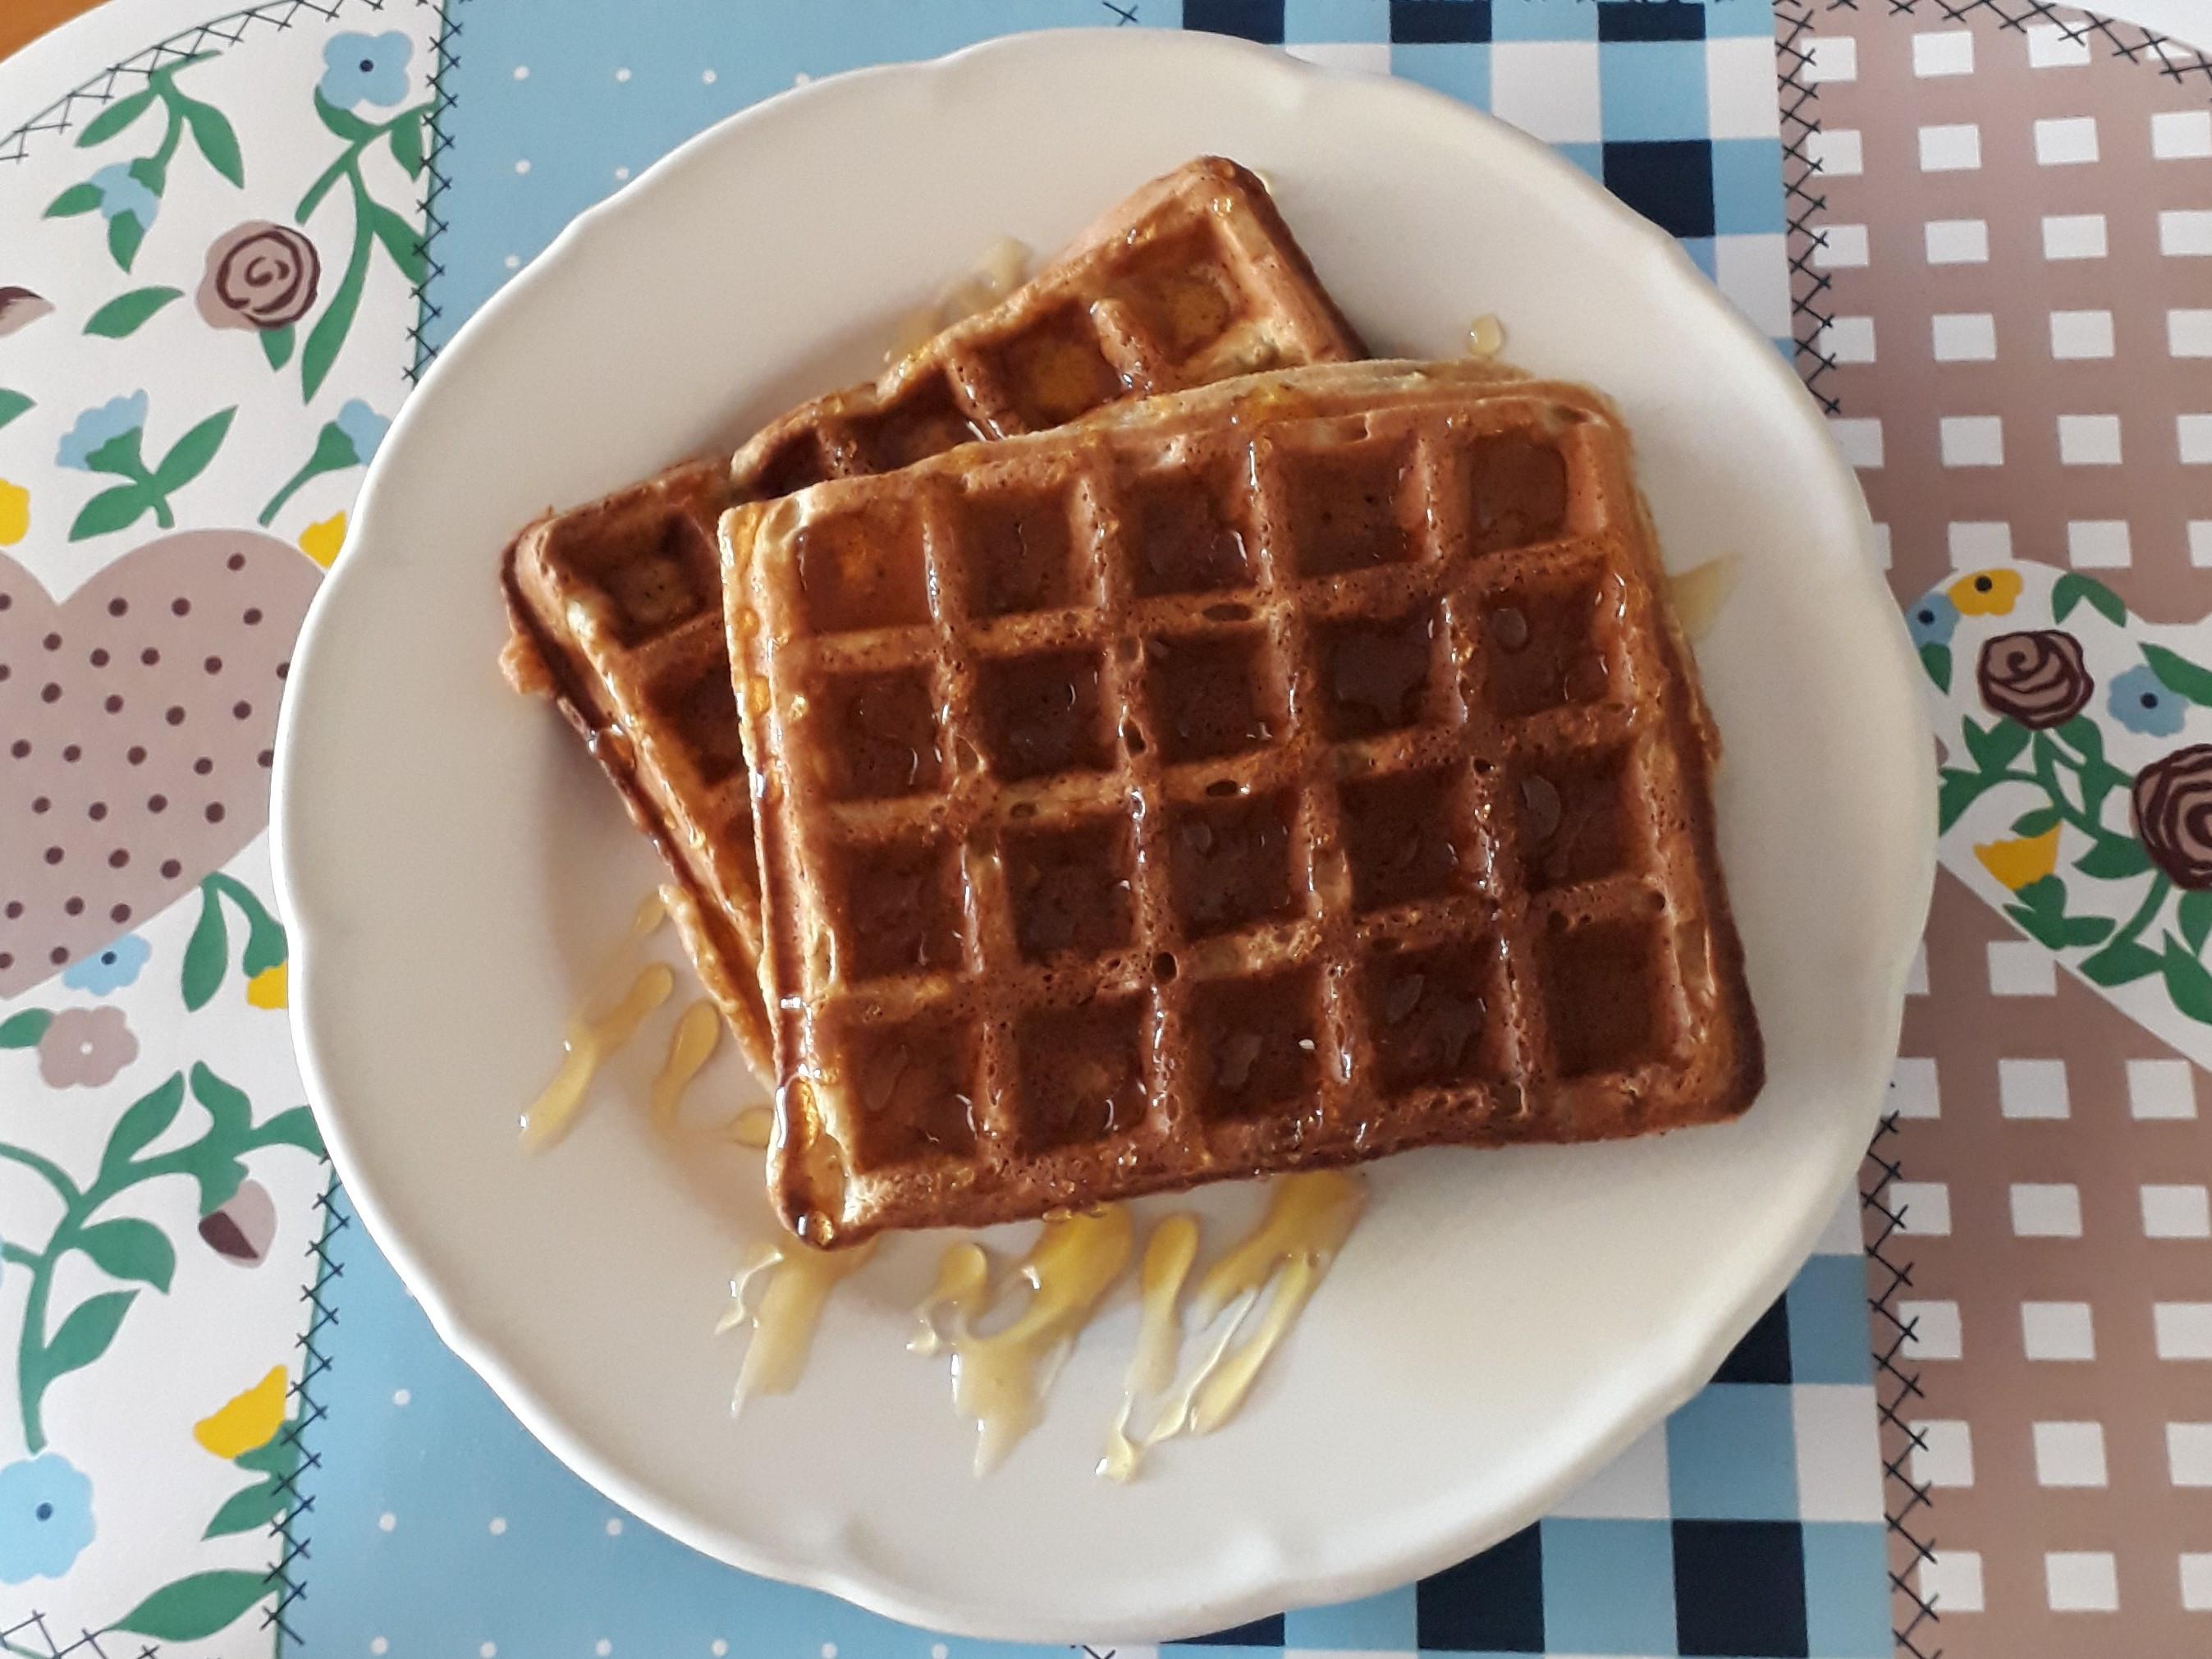 香蕉鬆餅 Belgian waffle